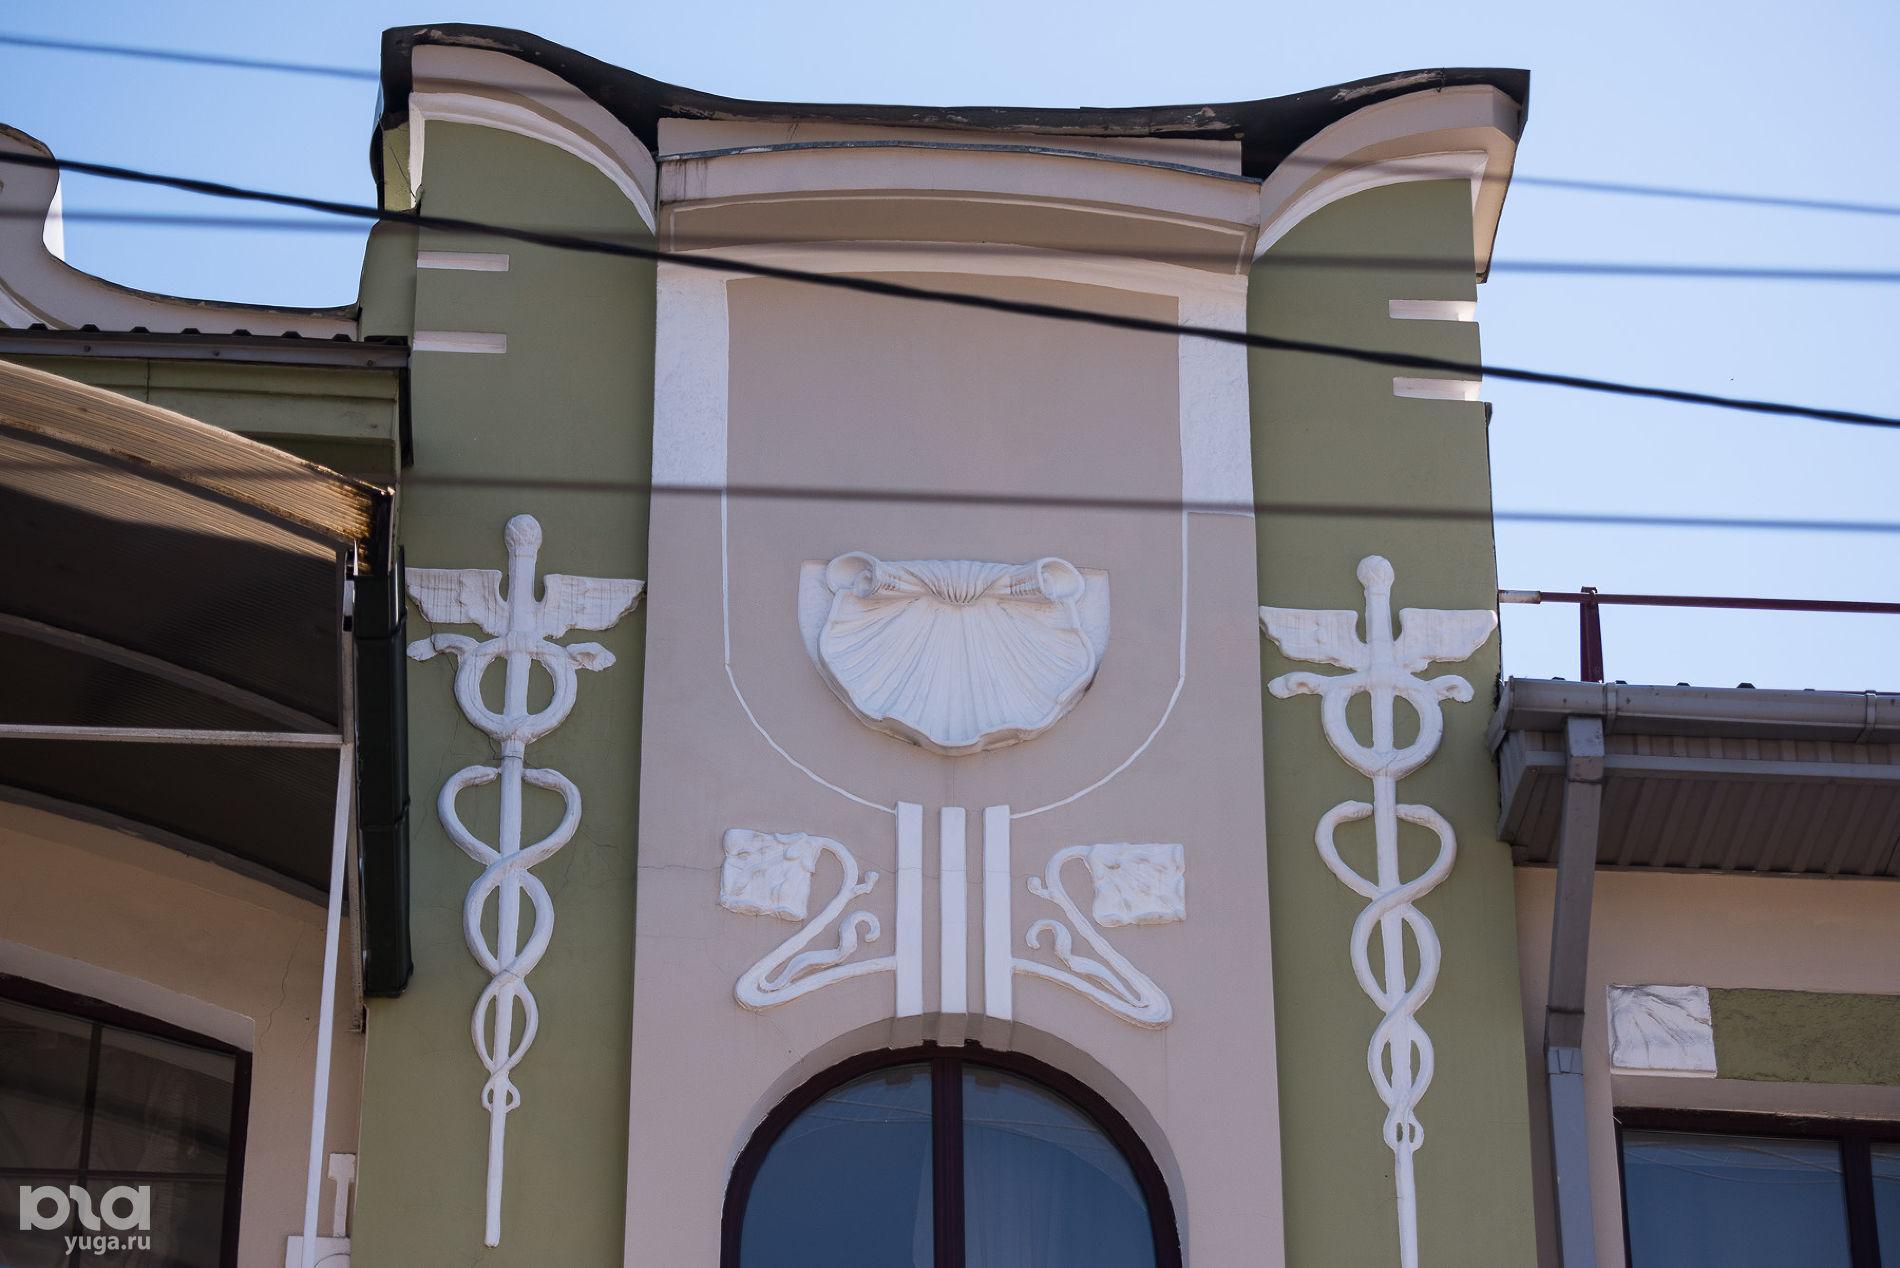 Баня купца А.Д. Адамули, 1881 год, ул. Октябрьская, 64 ©Фото Елены Синеок, Юга.ру